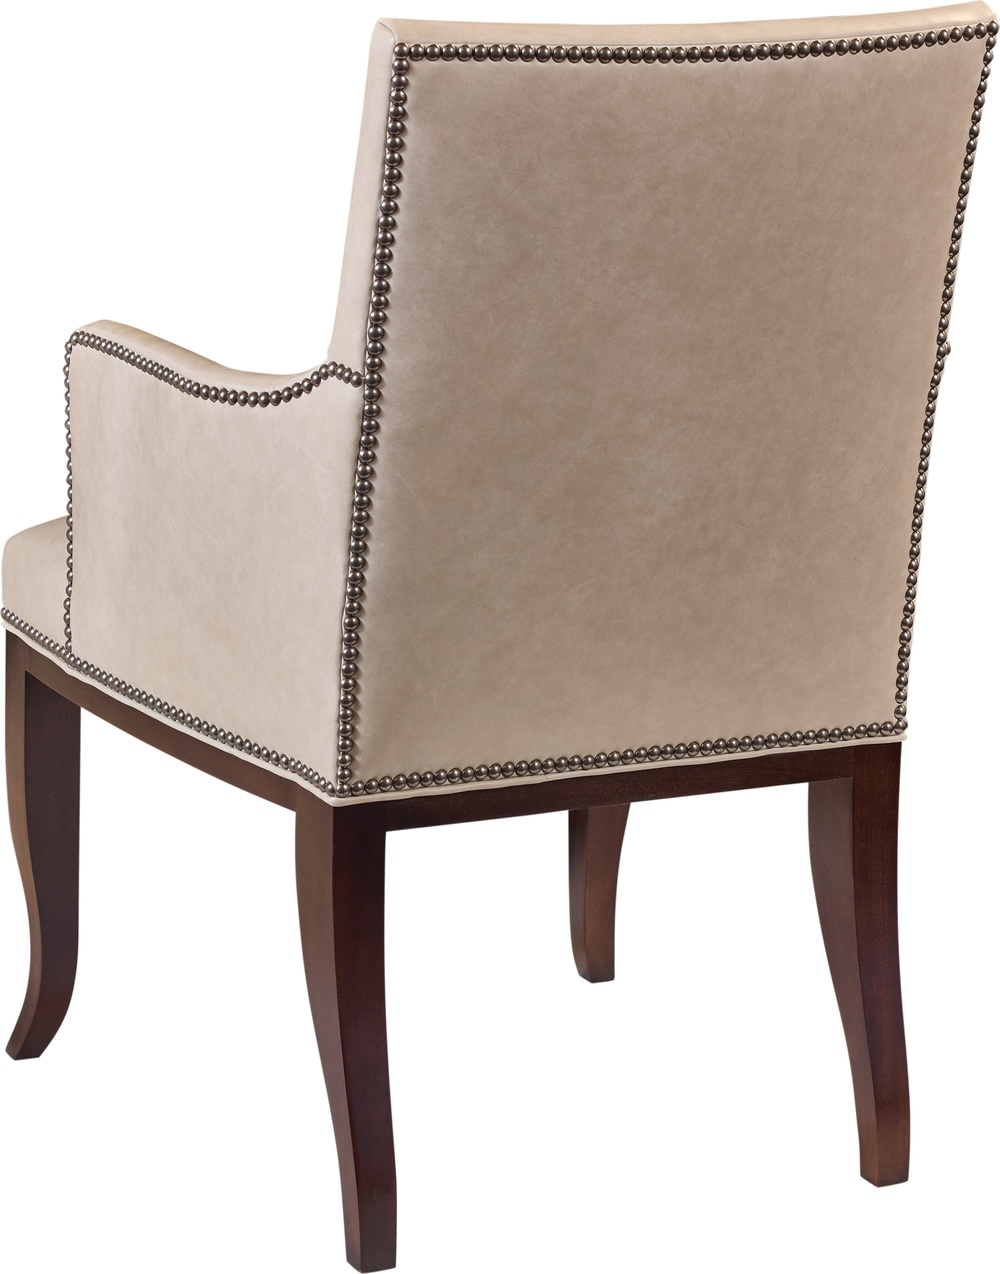 Hickory Chair - Handler Arm Chair